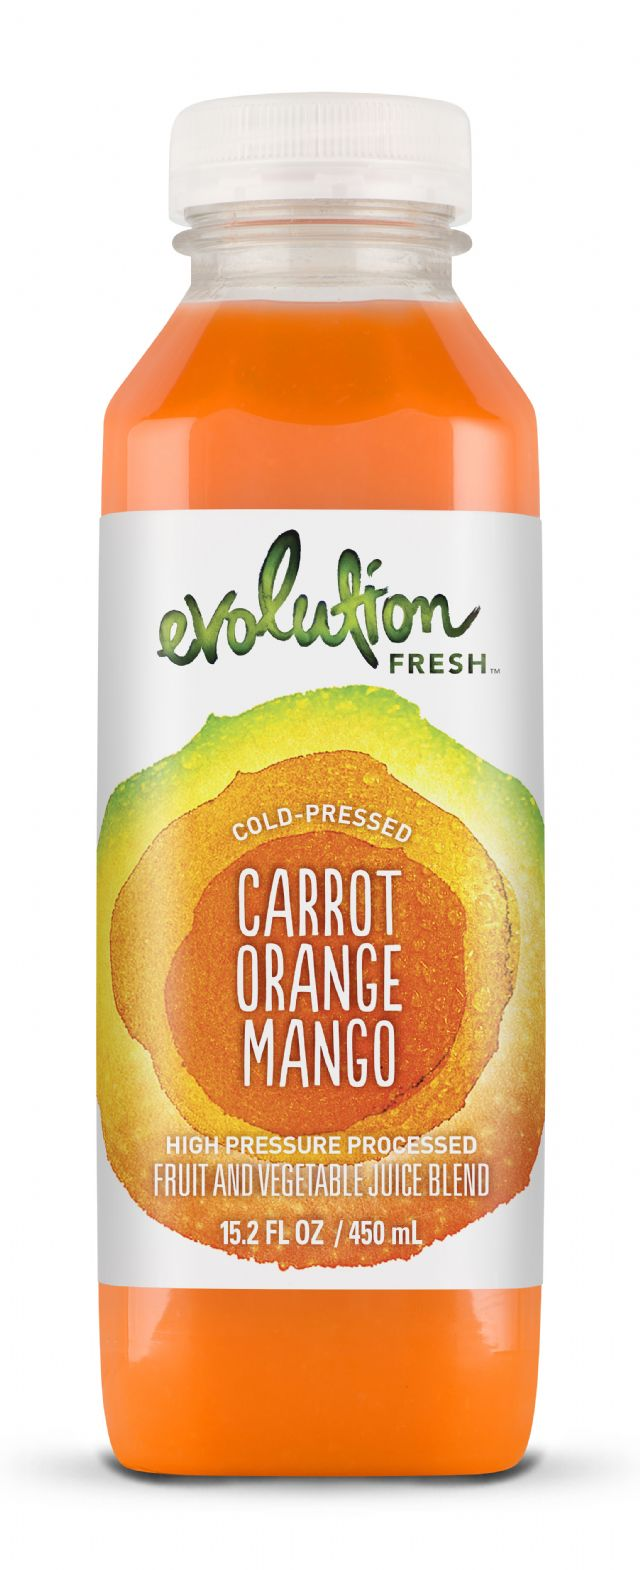 Evolution Fresh: CarrotOrangeMango copy